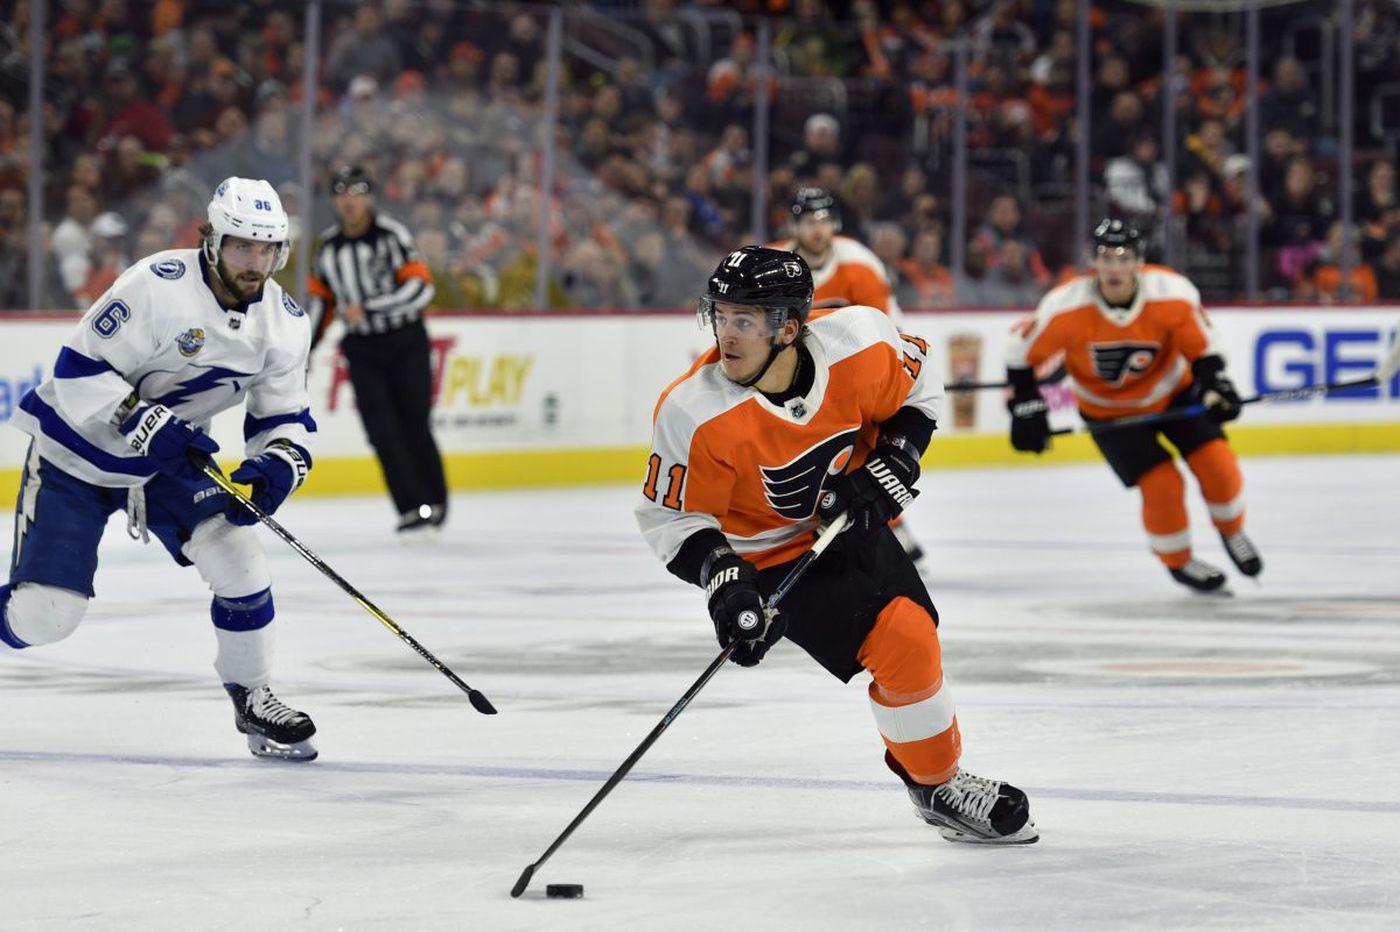 Lightning 5, Flyers 1: Travis Konecny is sizzling, but Dave Hakstol's team needs a break